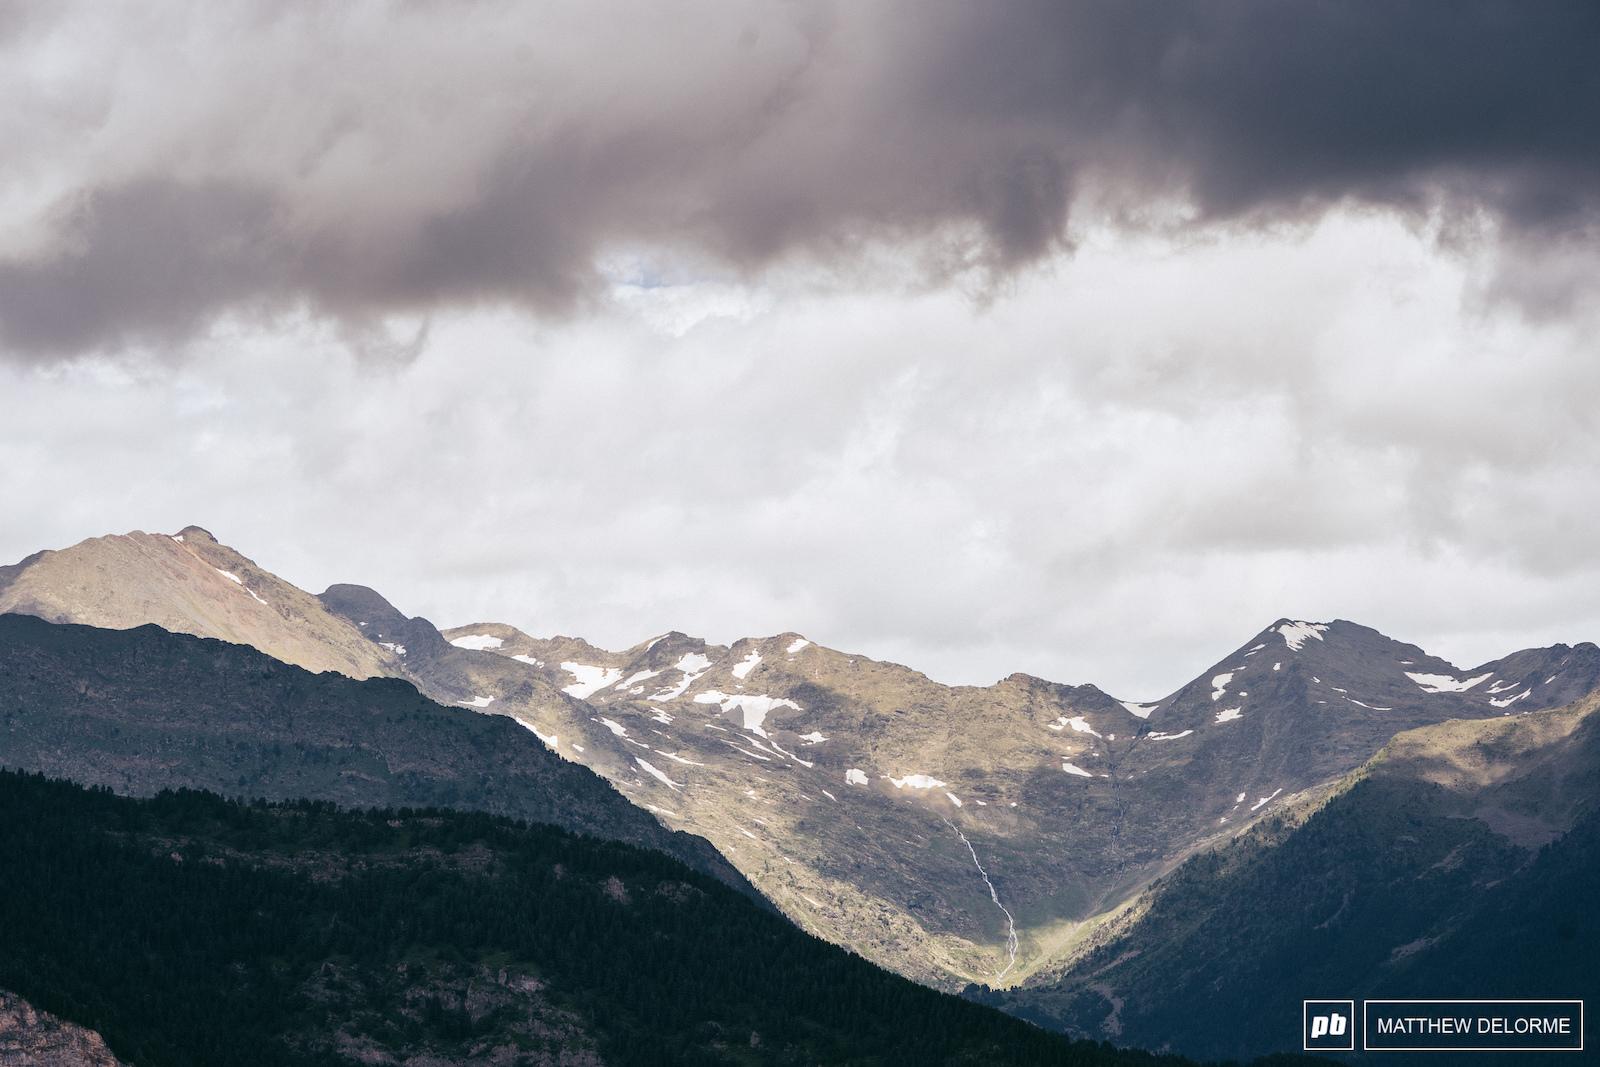 Andorra you beauty.